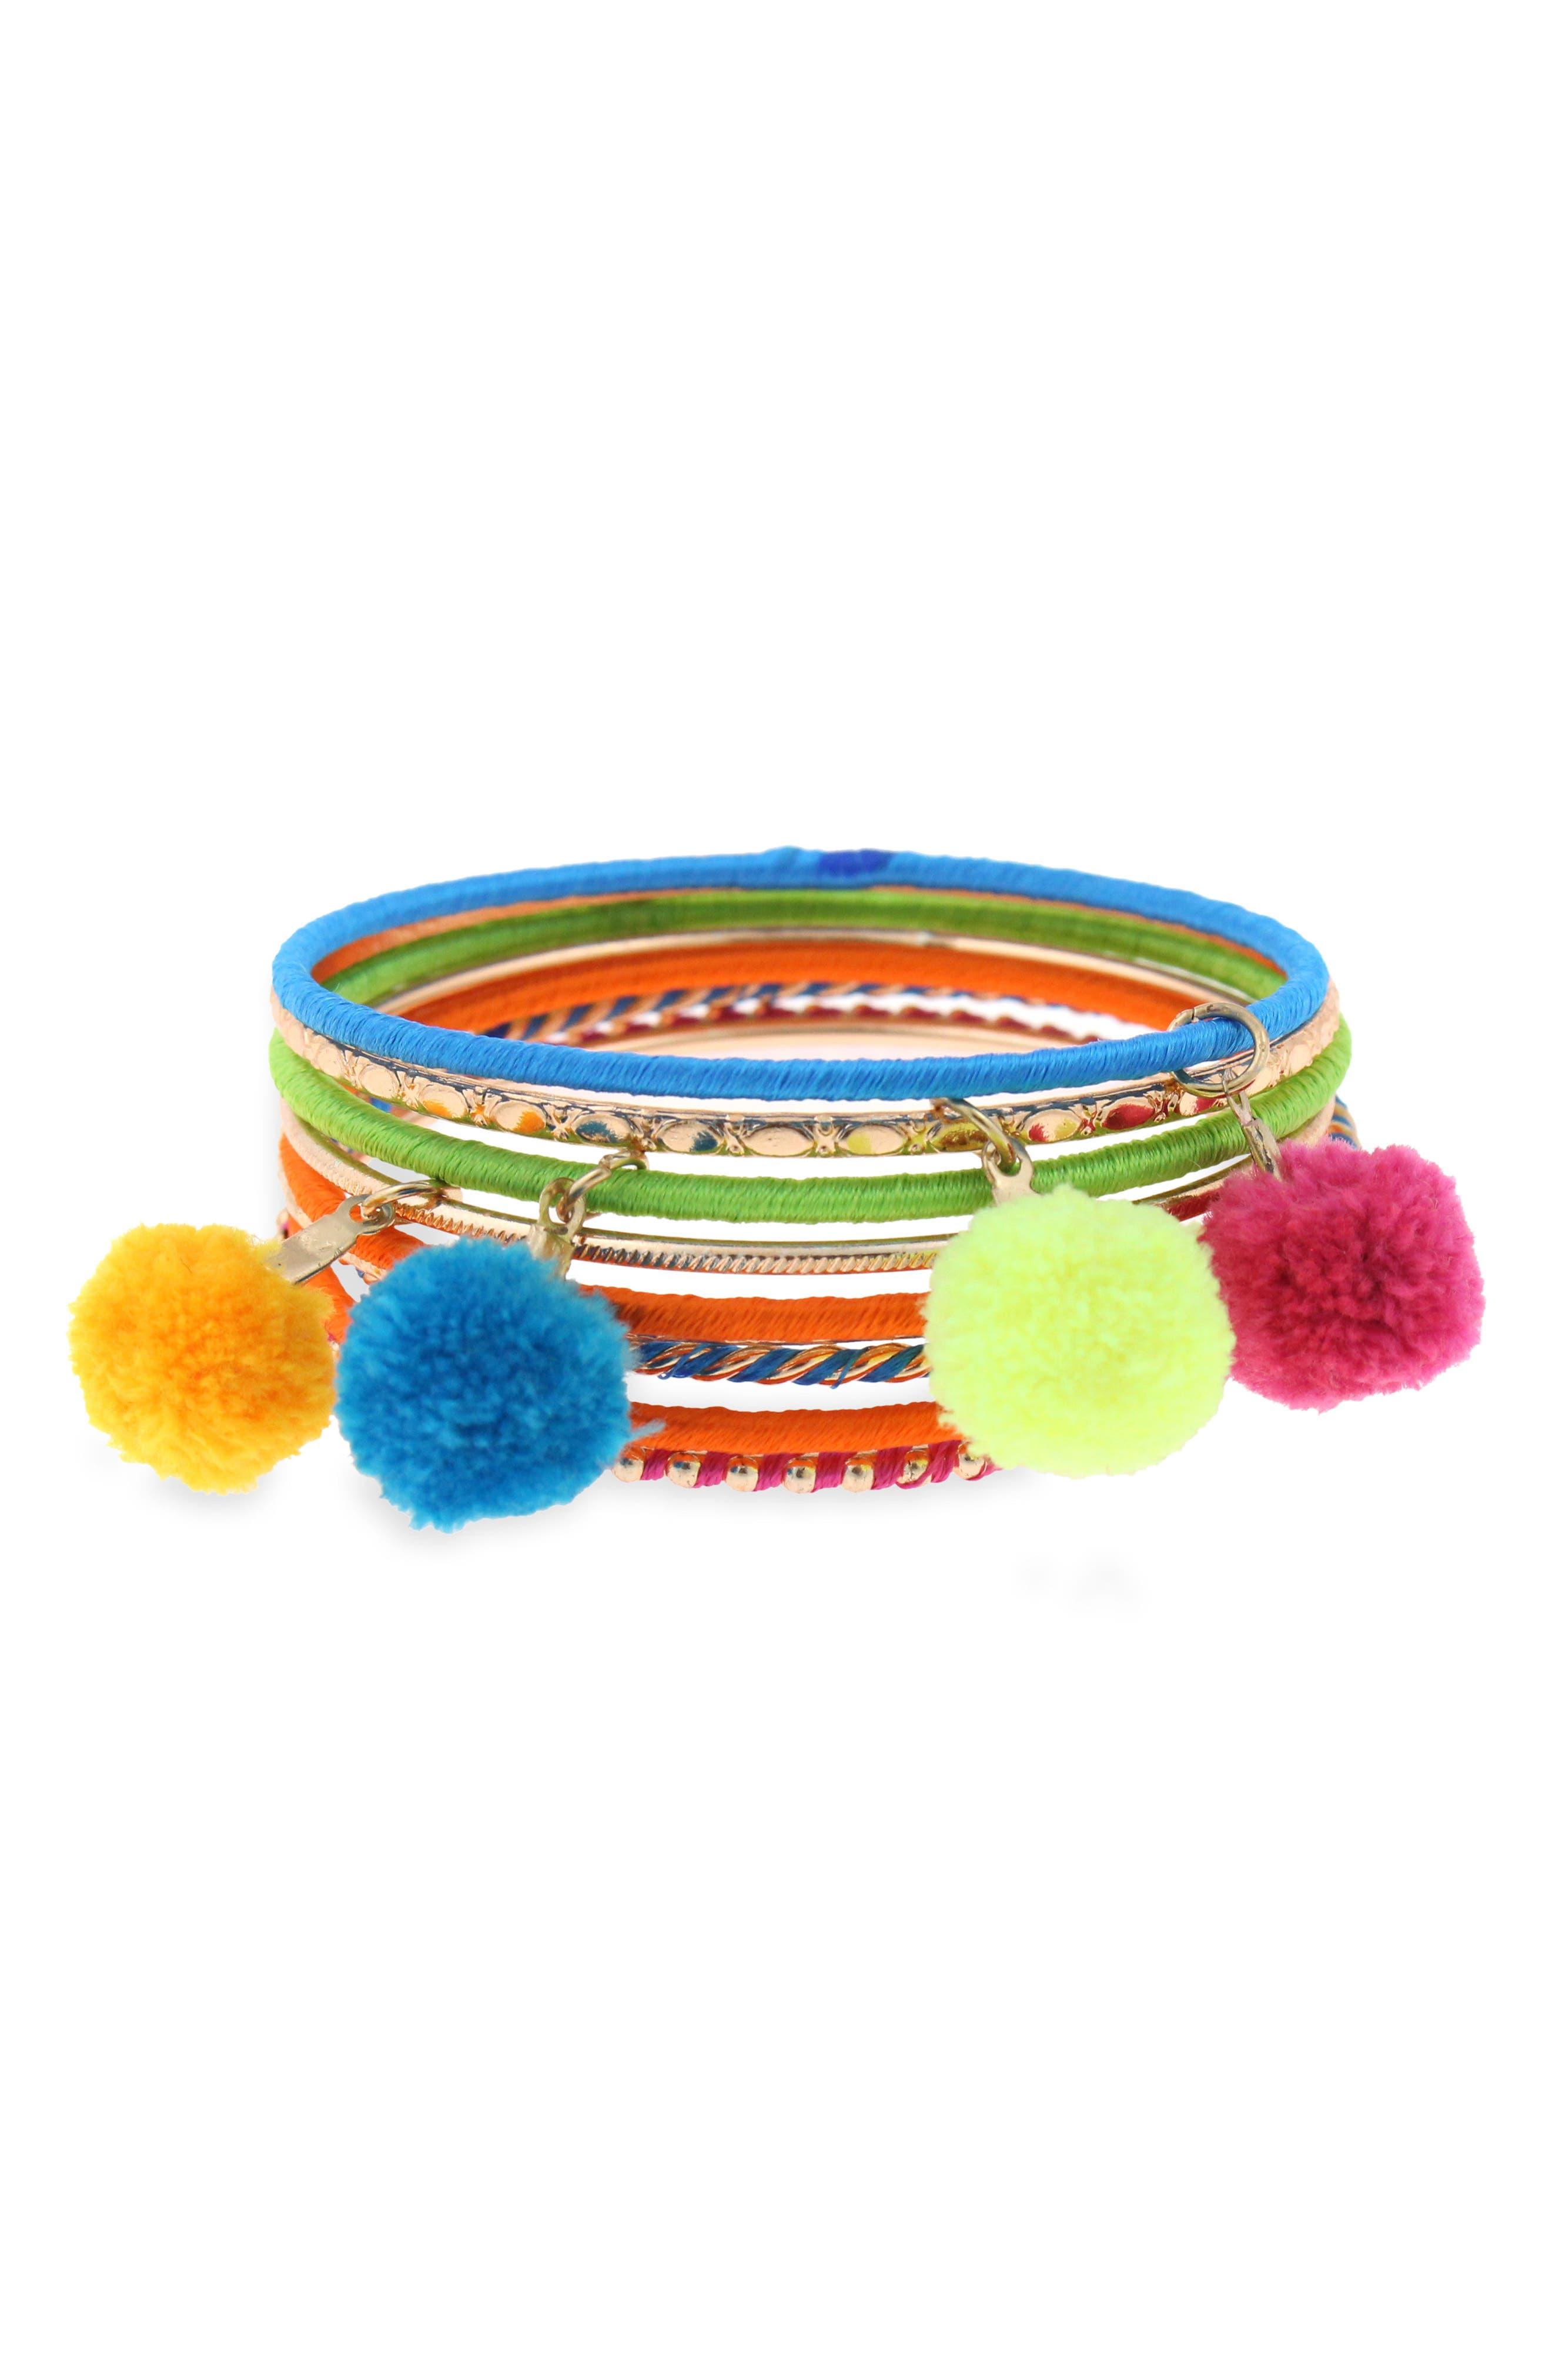 Alternate Image 1 Selected - Capelli New York Set of 9 Bangle Bracelets